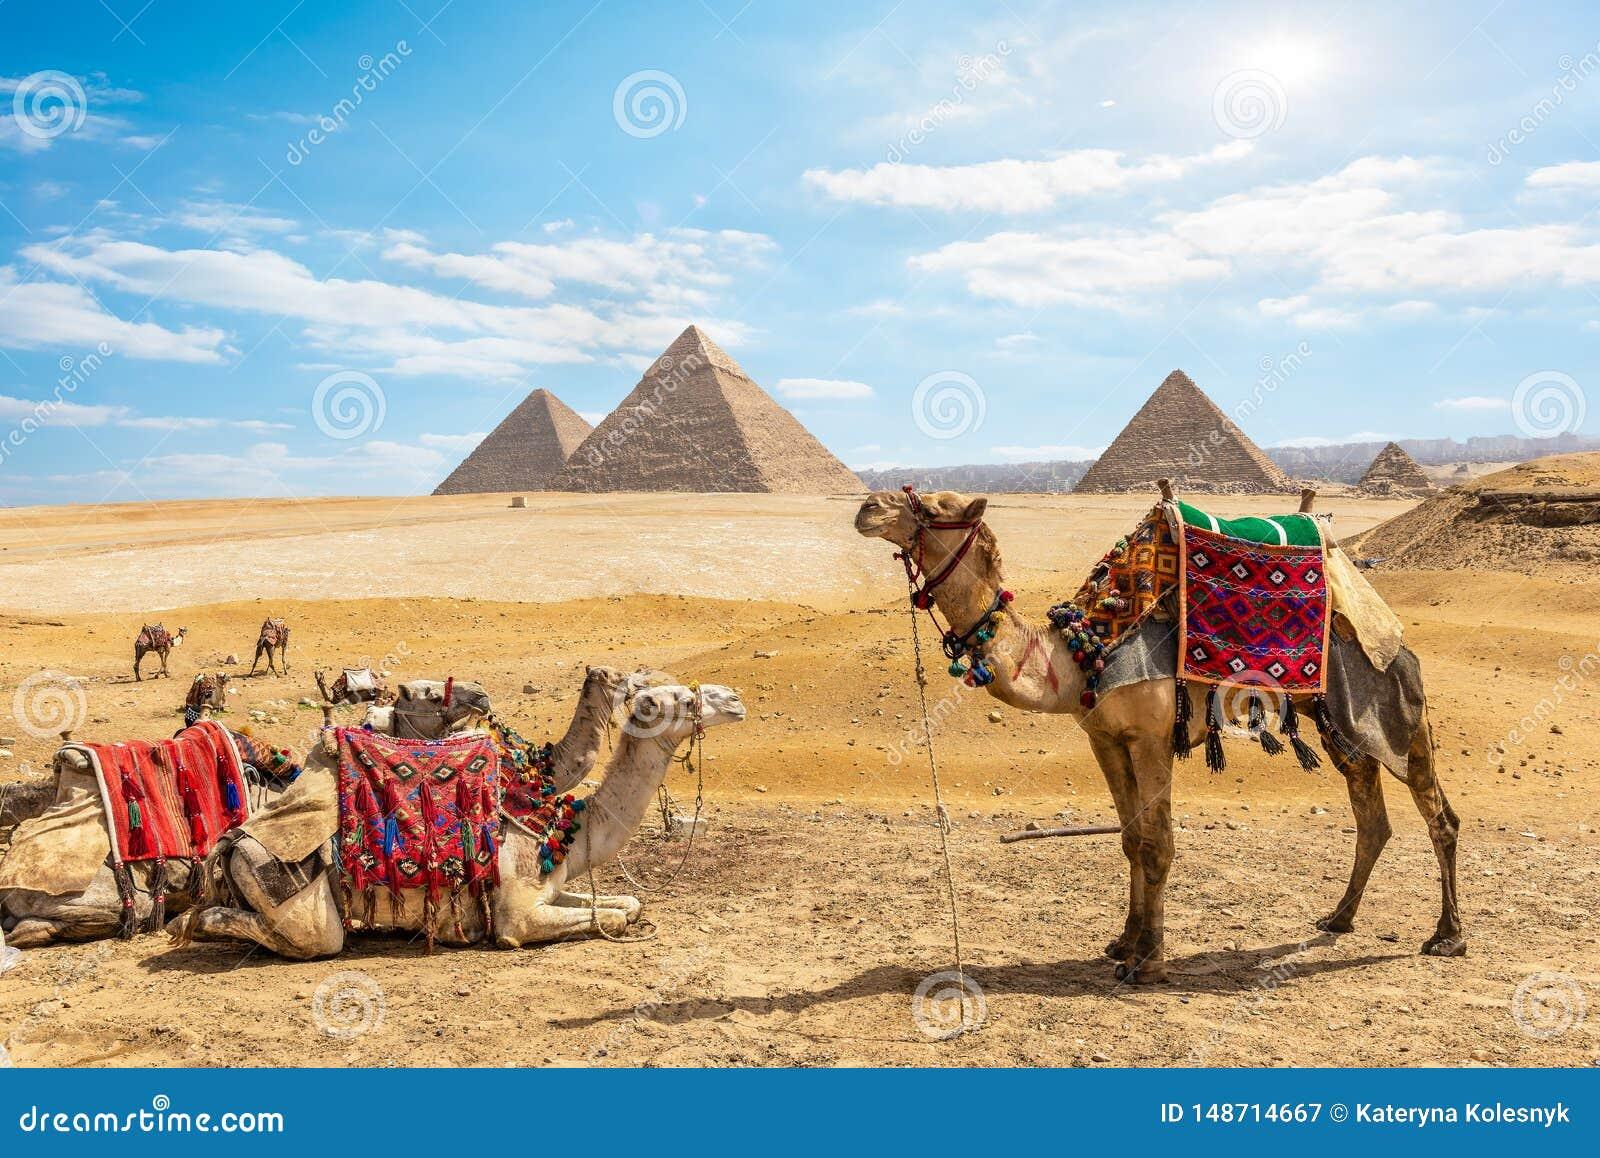 Kamele nahe Pyramiden in Kairo